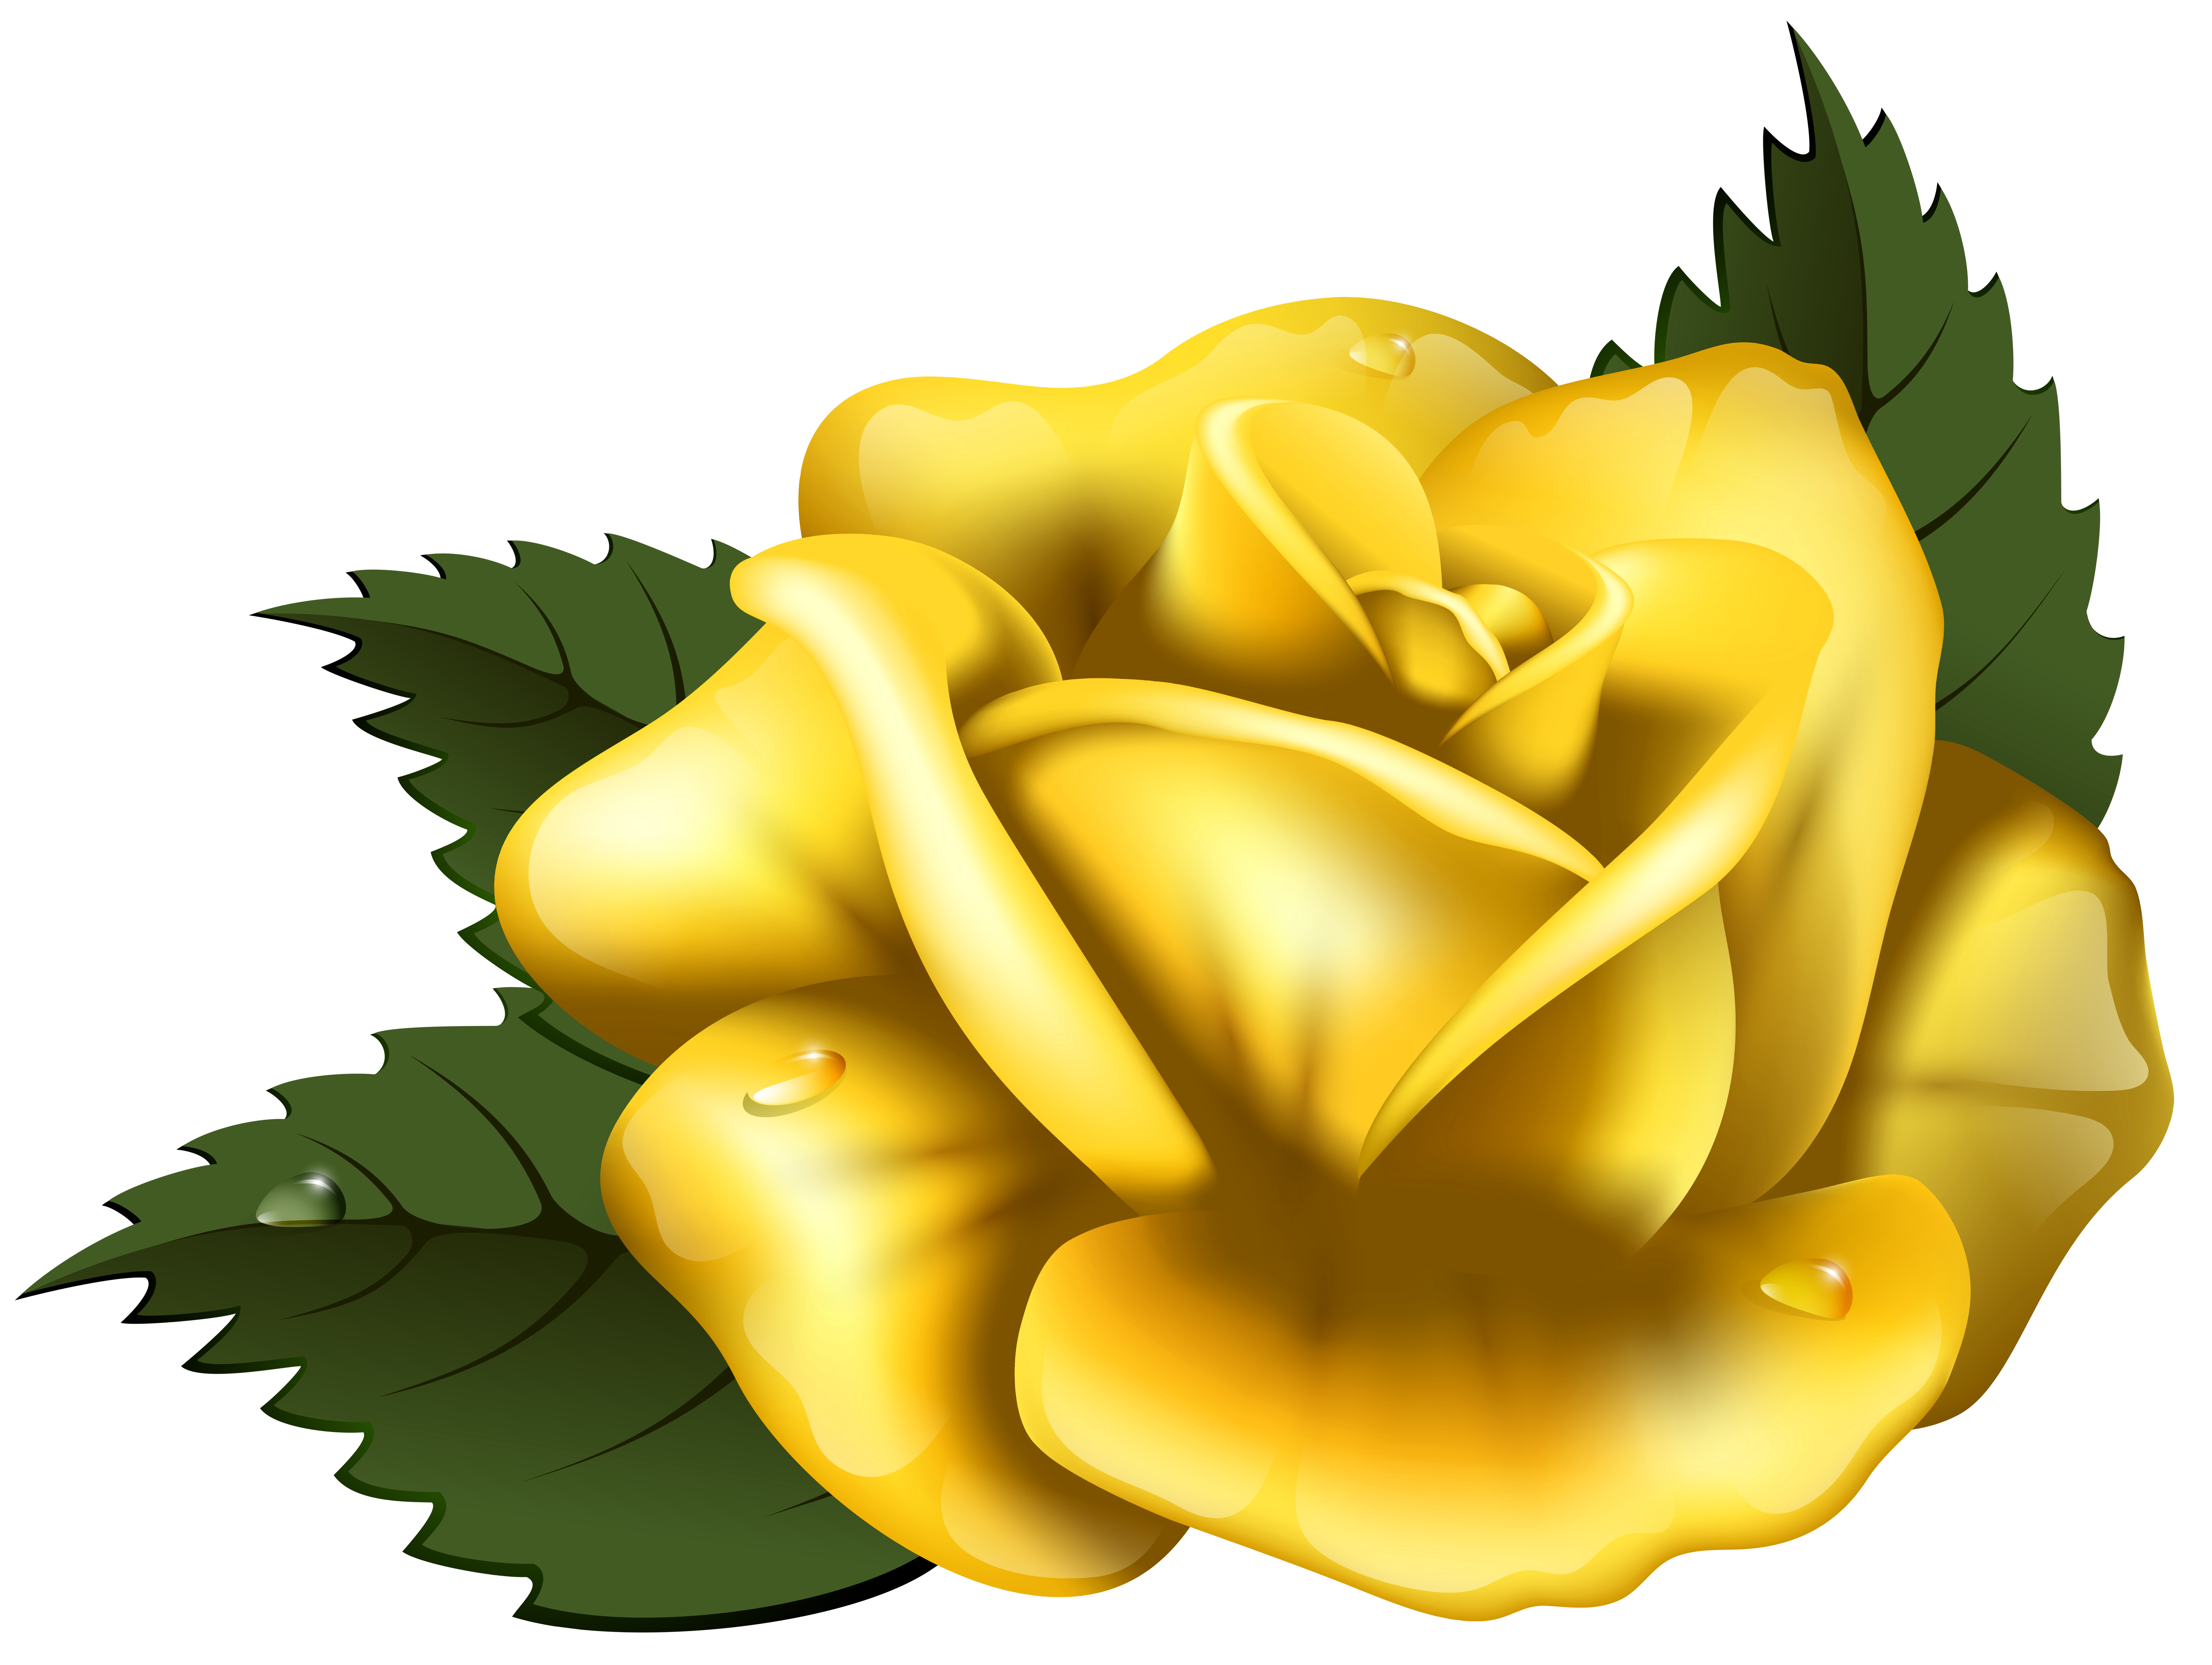 ... yellow rose clip art u2013 Clipart F-... yellow rose clip art u2013 Clipart Free Download ...-6